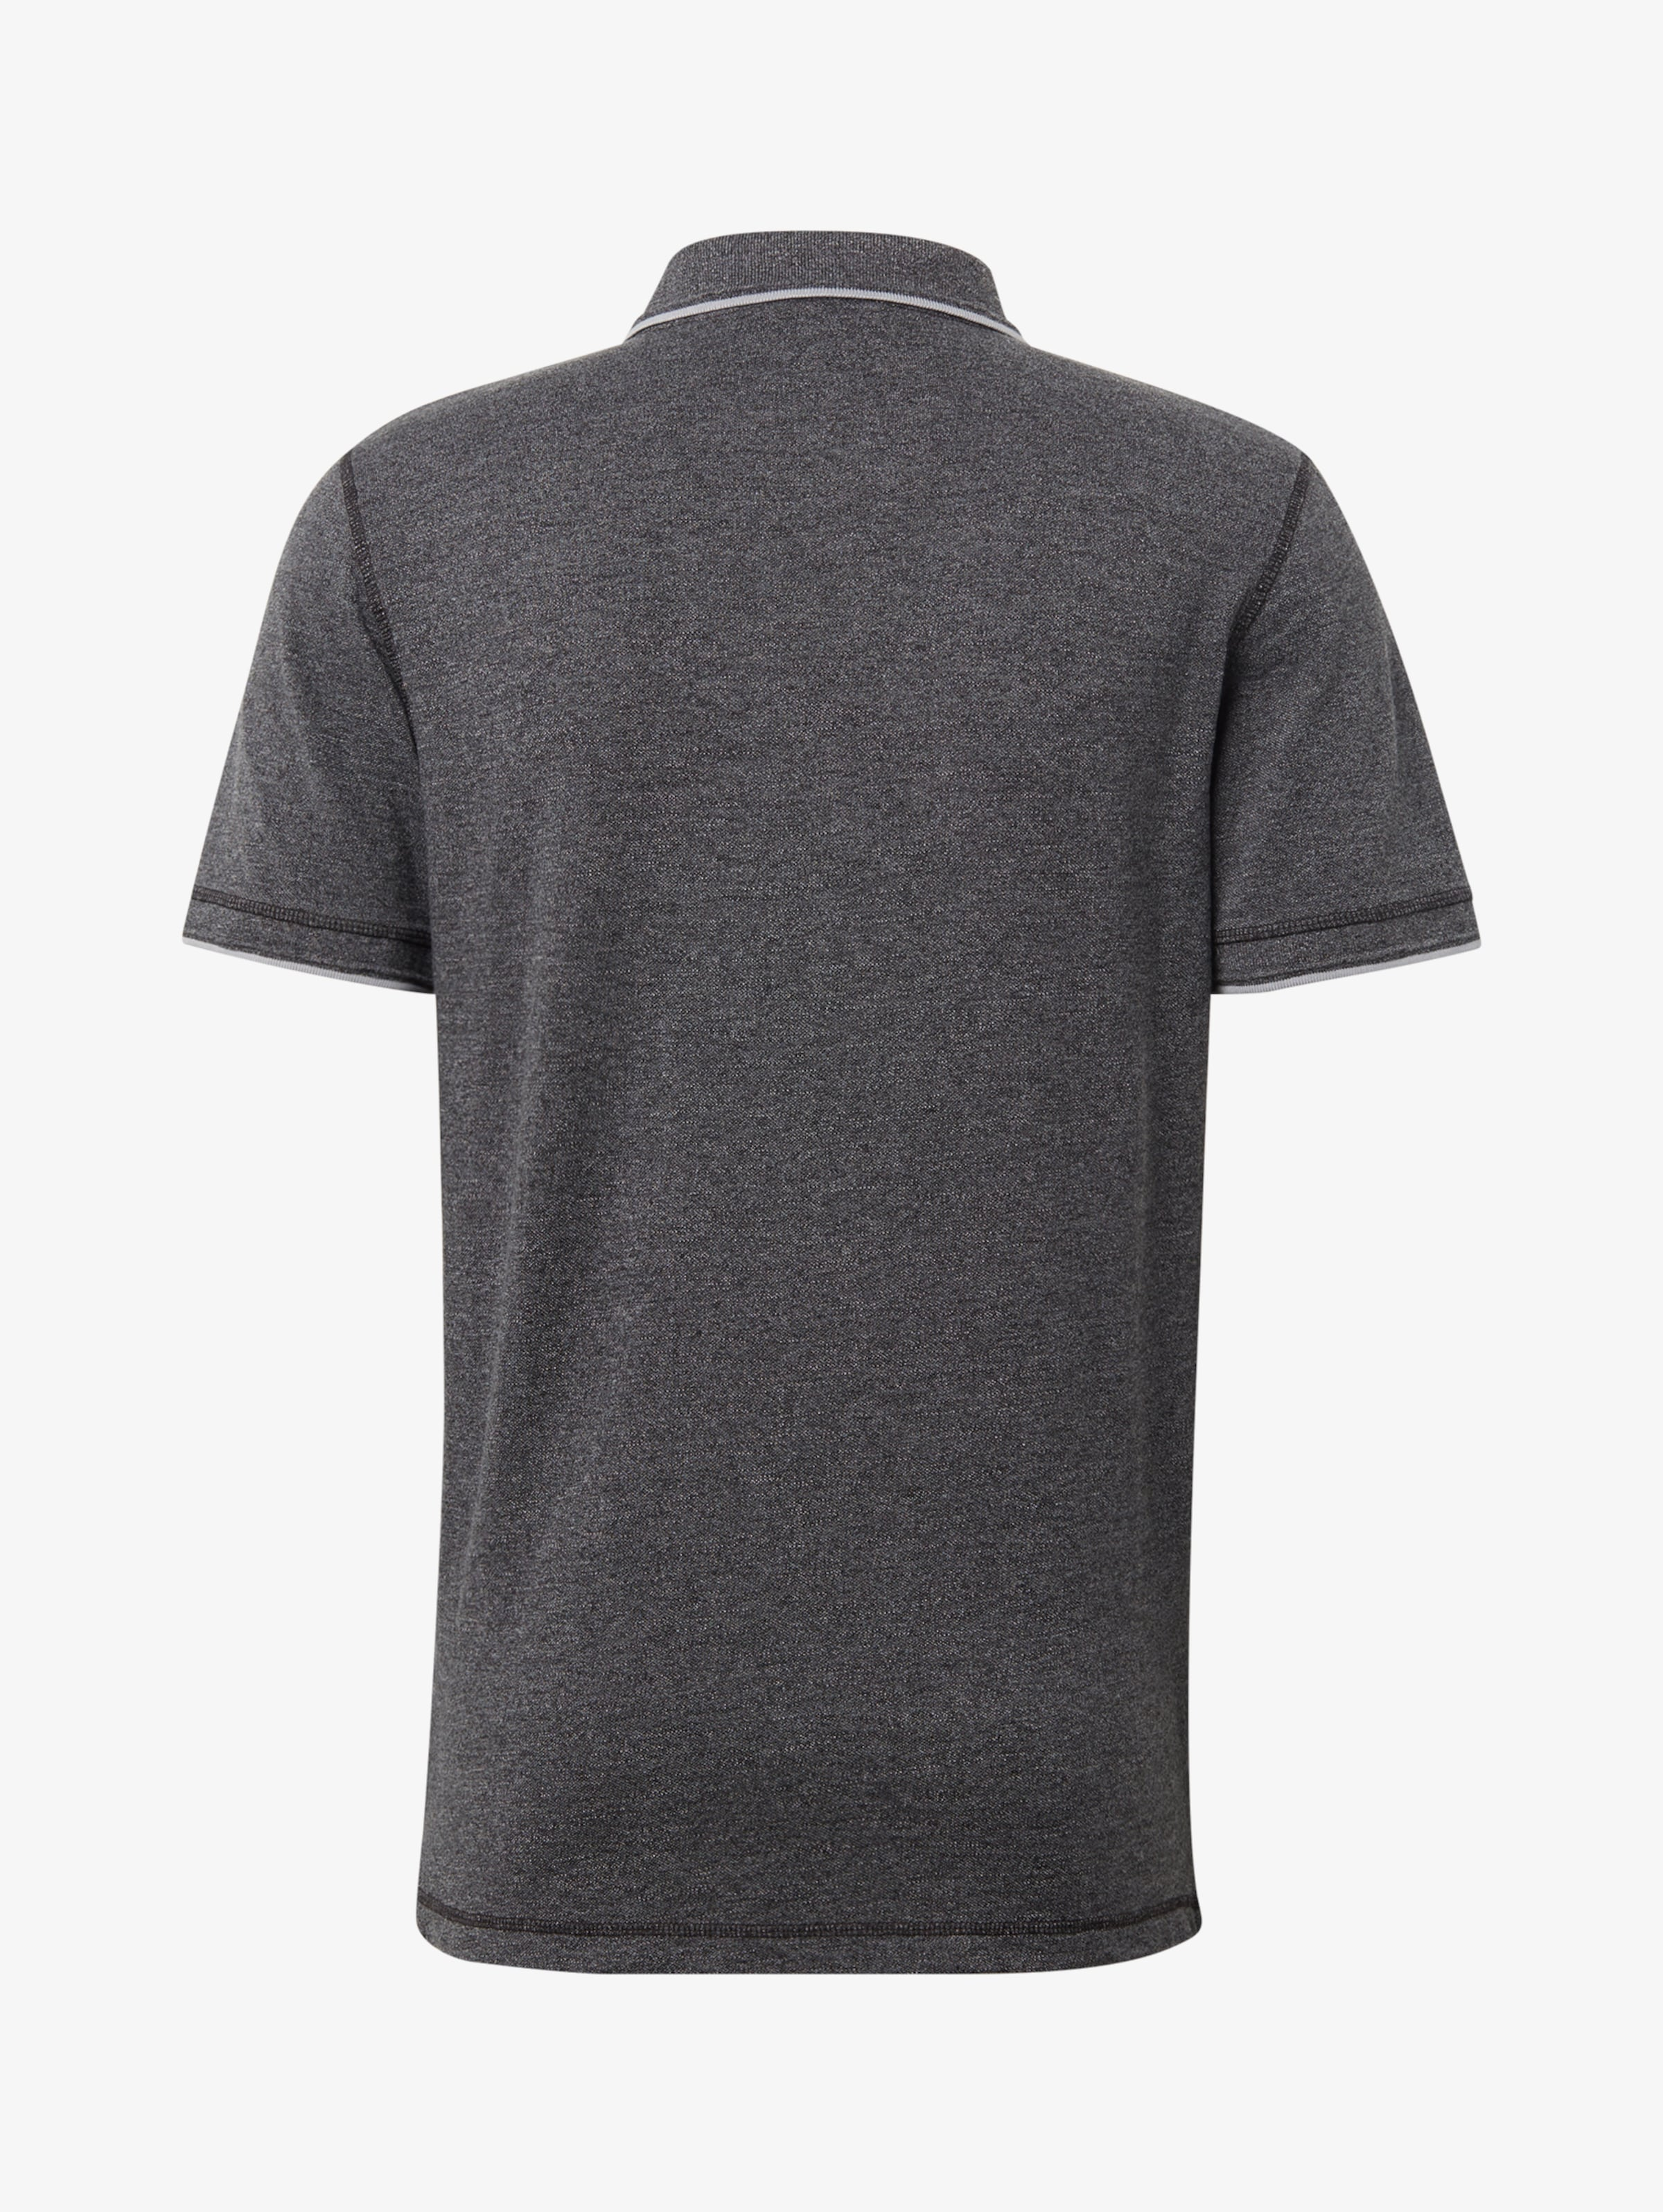 Tom Tailor Tailor In BasaltgrauWeiß In Shirt Tom Shirt qMSpzUV